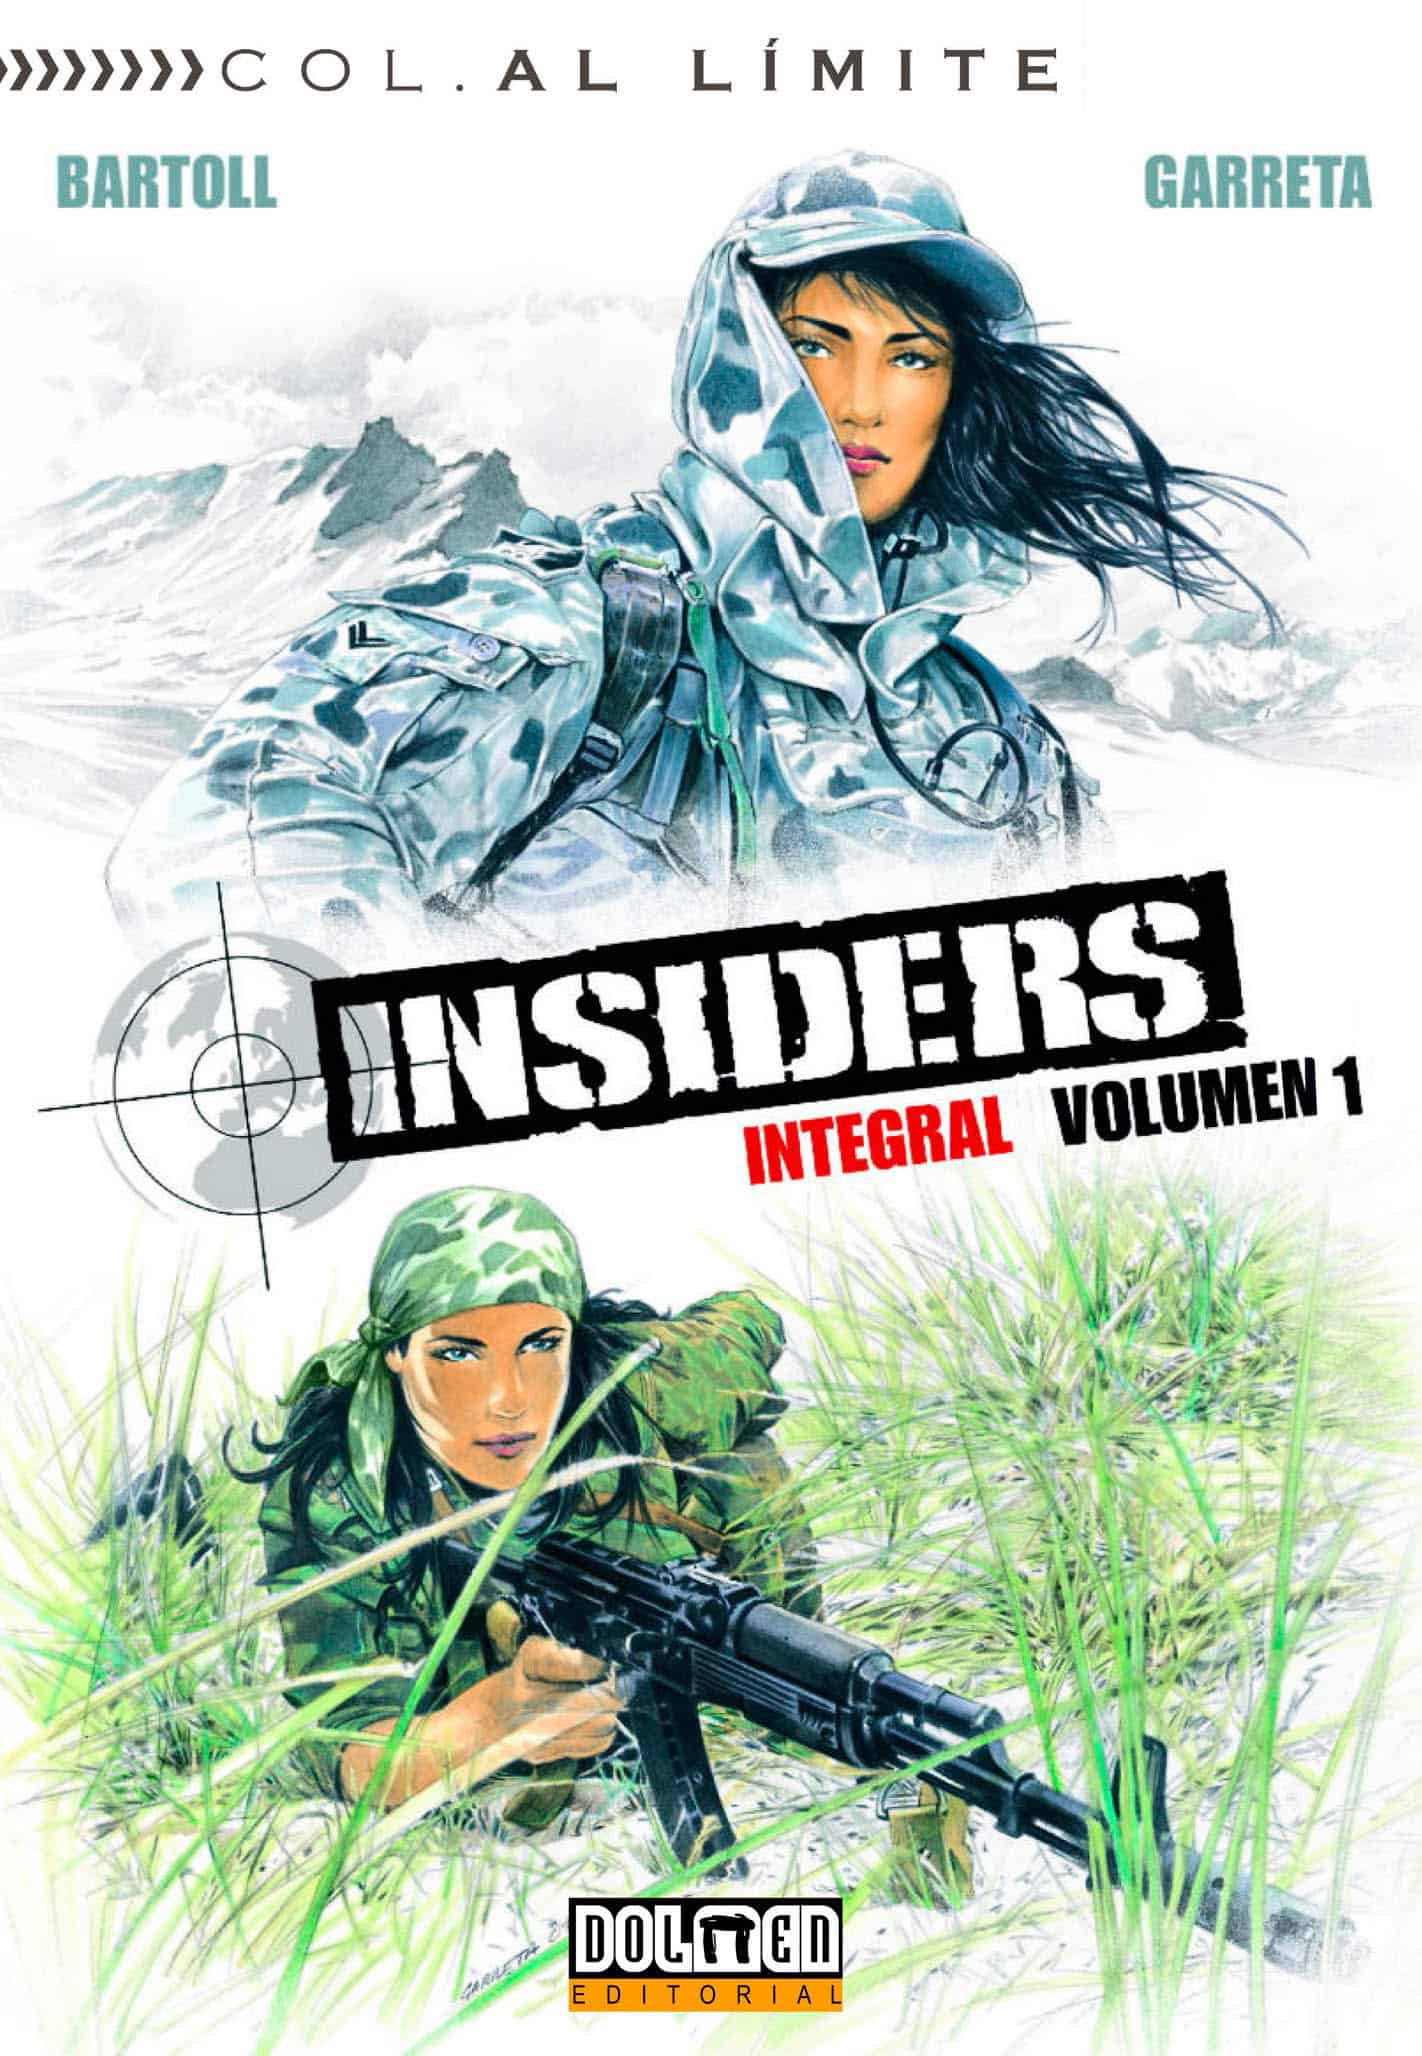 INSIDERS INTEGRAL VOL. 01